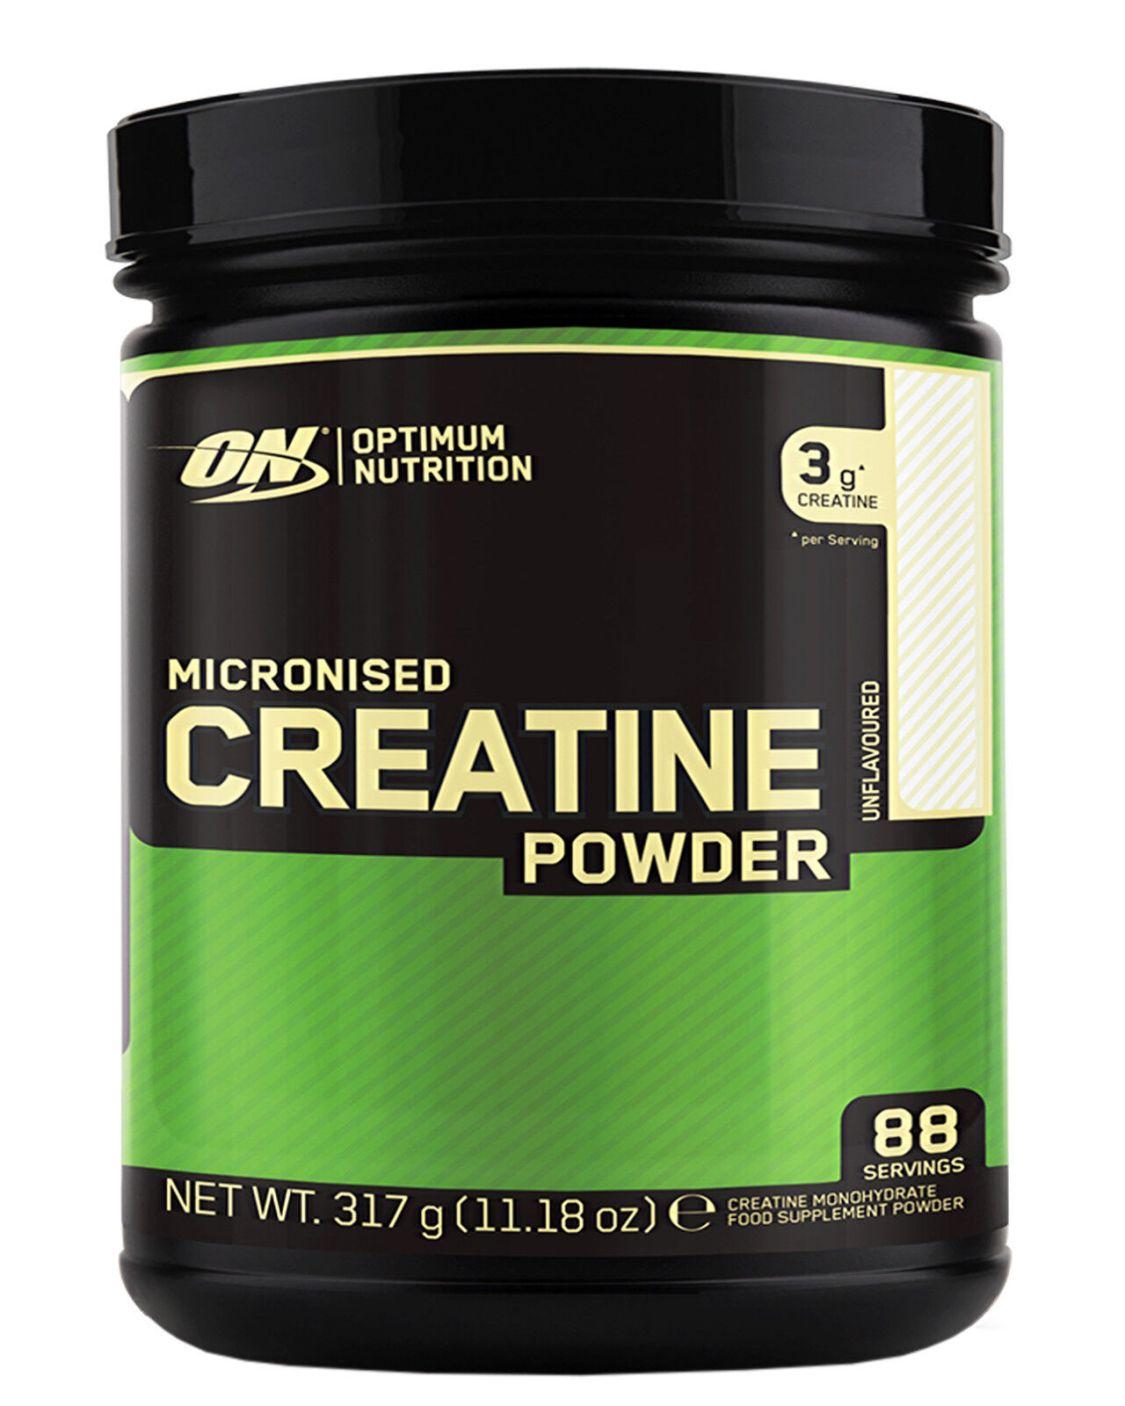 Optimum Nutrition Creatine Powder 317g Kreatin Monohydrat Kraft Muskelaufbau